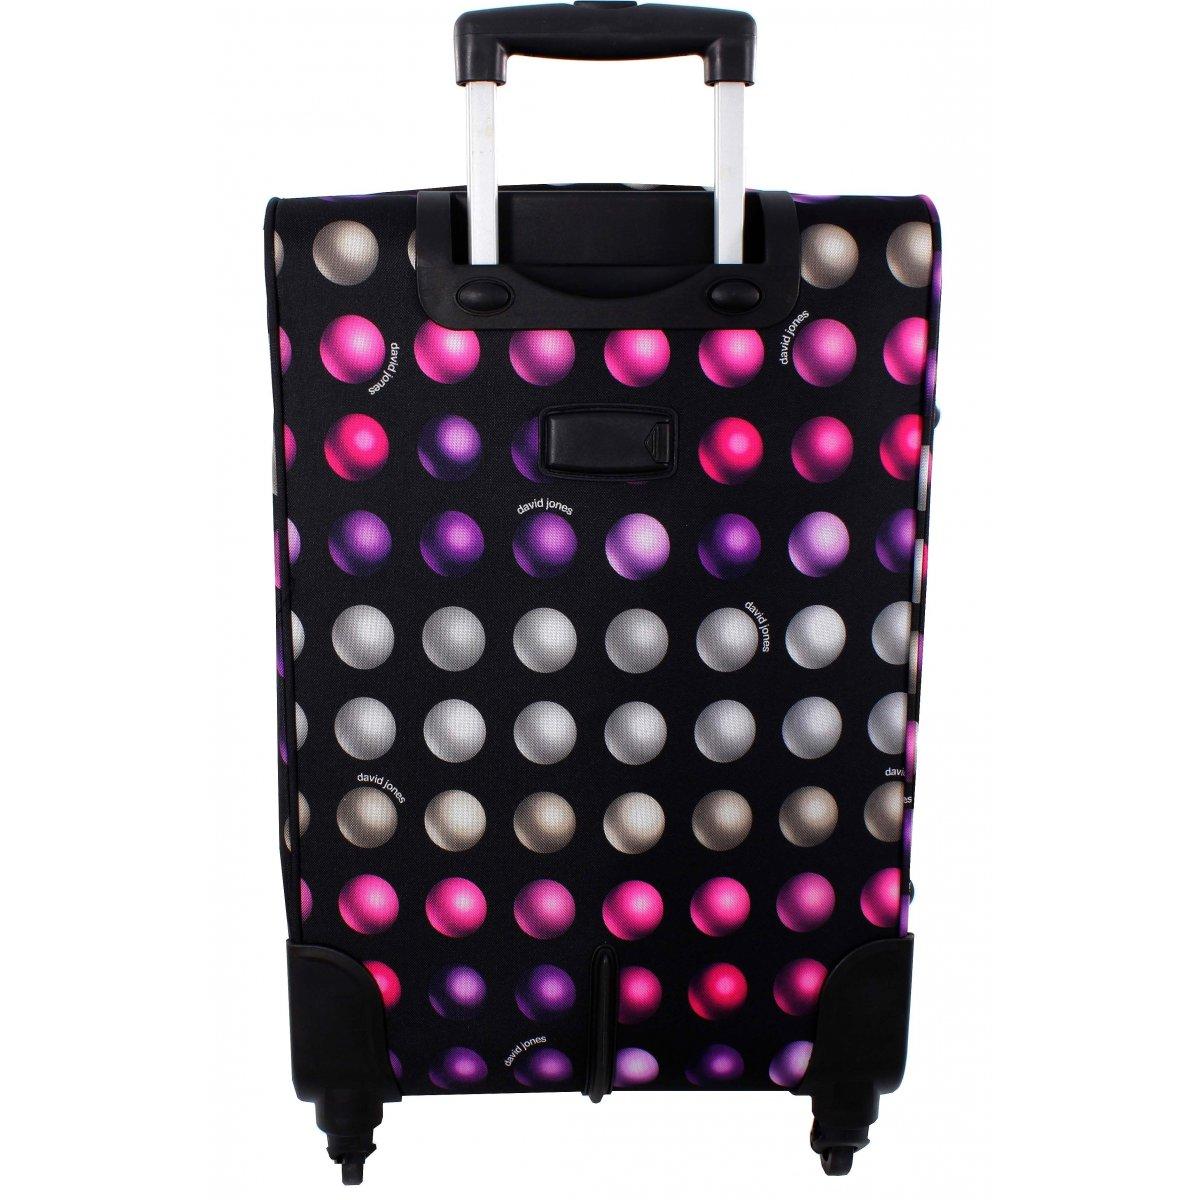 lot 3 valises dont 1 cabine ryanair david jones r20033 couleur principale buzz rose. Black Bedroom Furniture Sets. Home Design Ideas